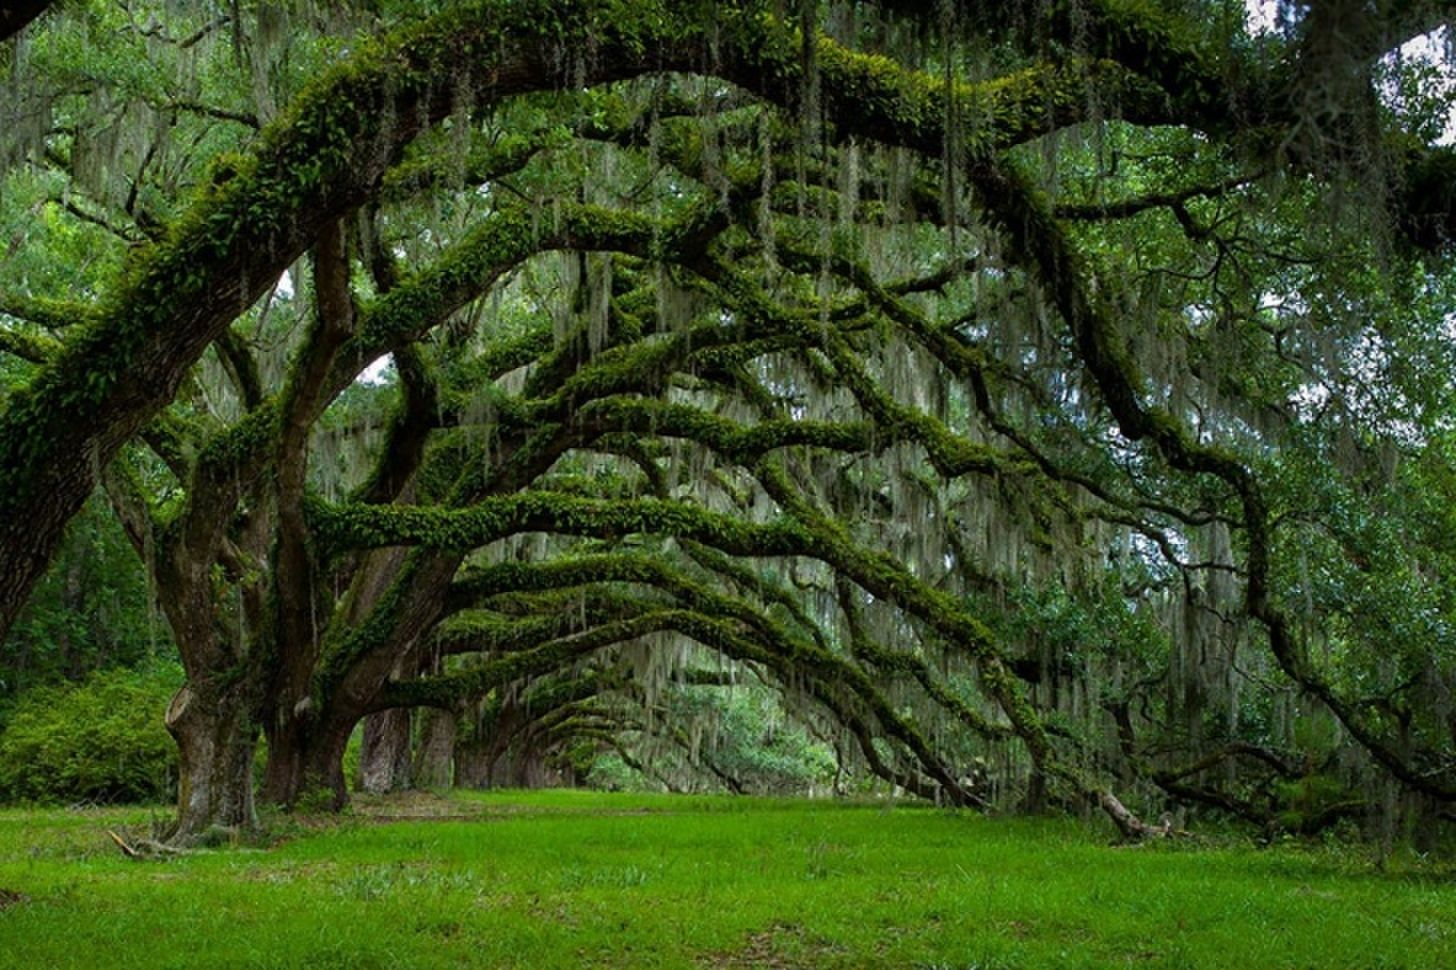 Meşe Bulvarı, Güney Carolina, ABD. Fotografía de árboles